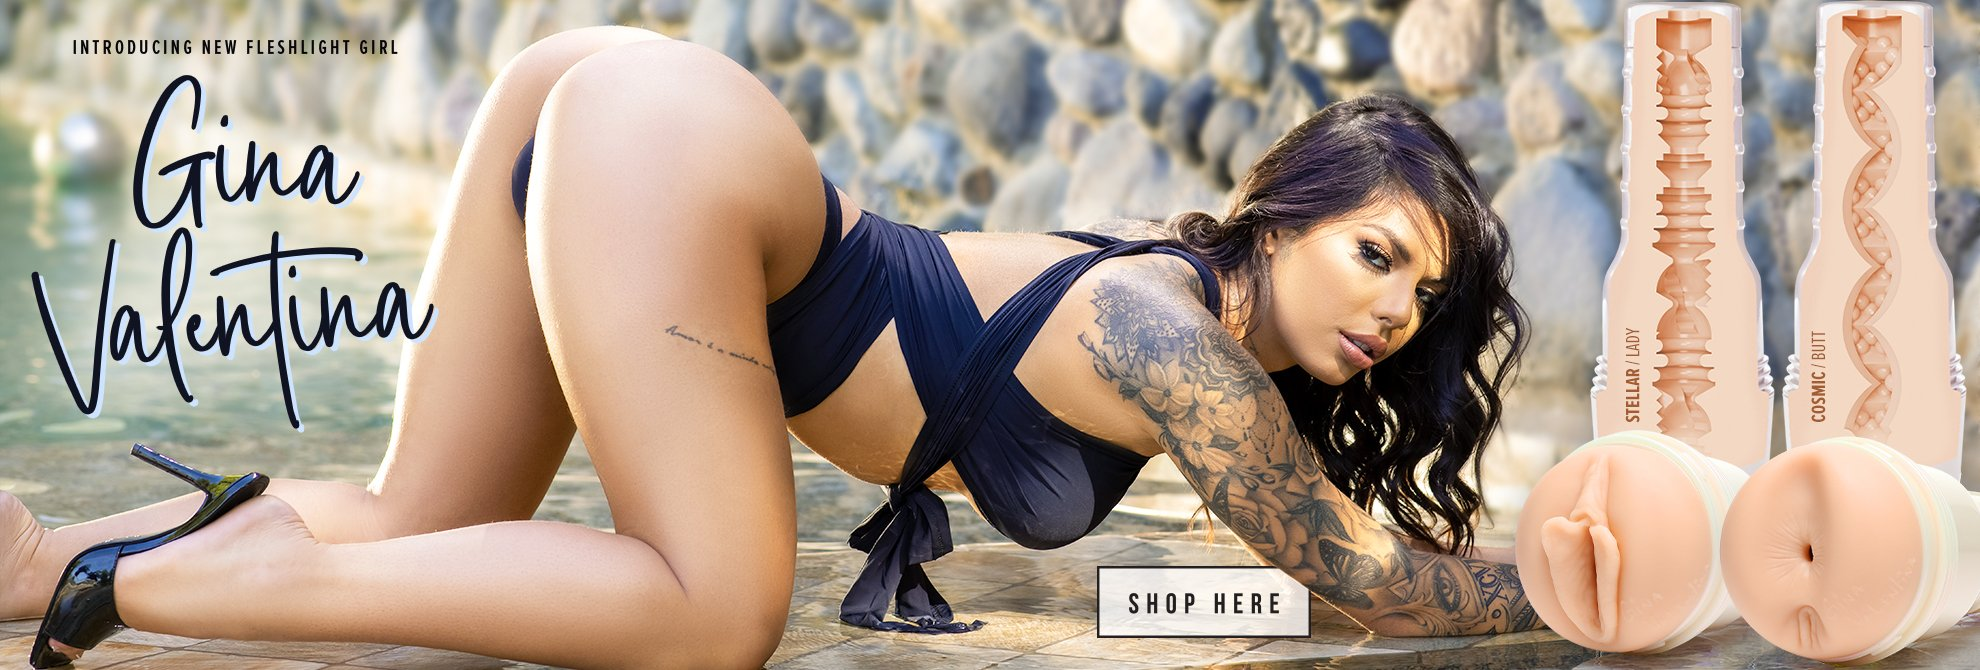 Gina Valentina Fleshlight Girl Image 0